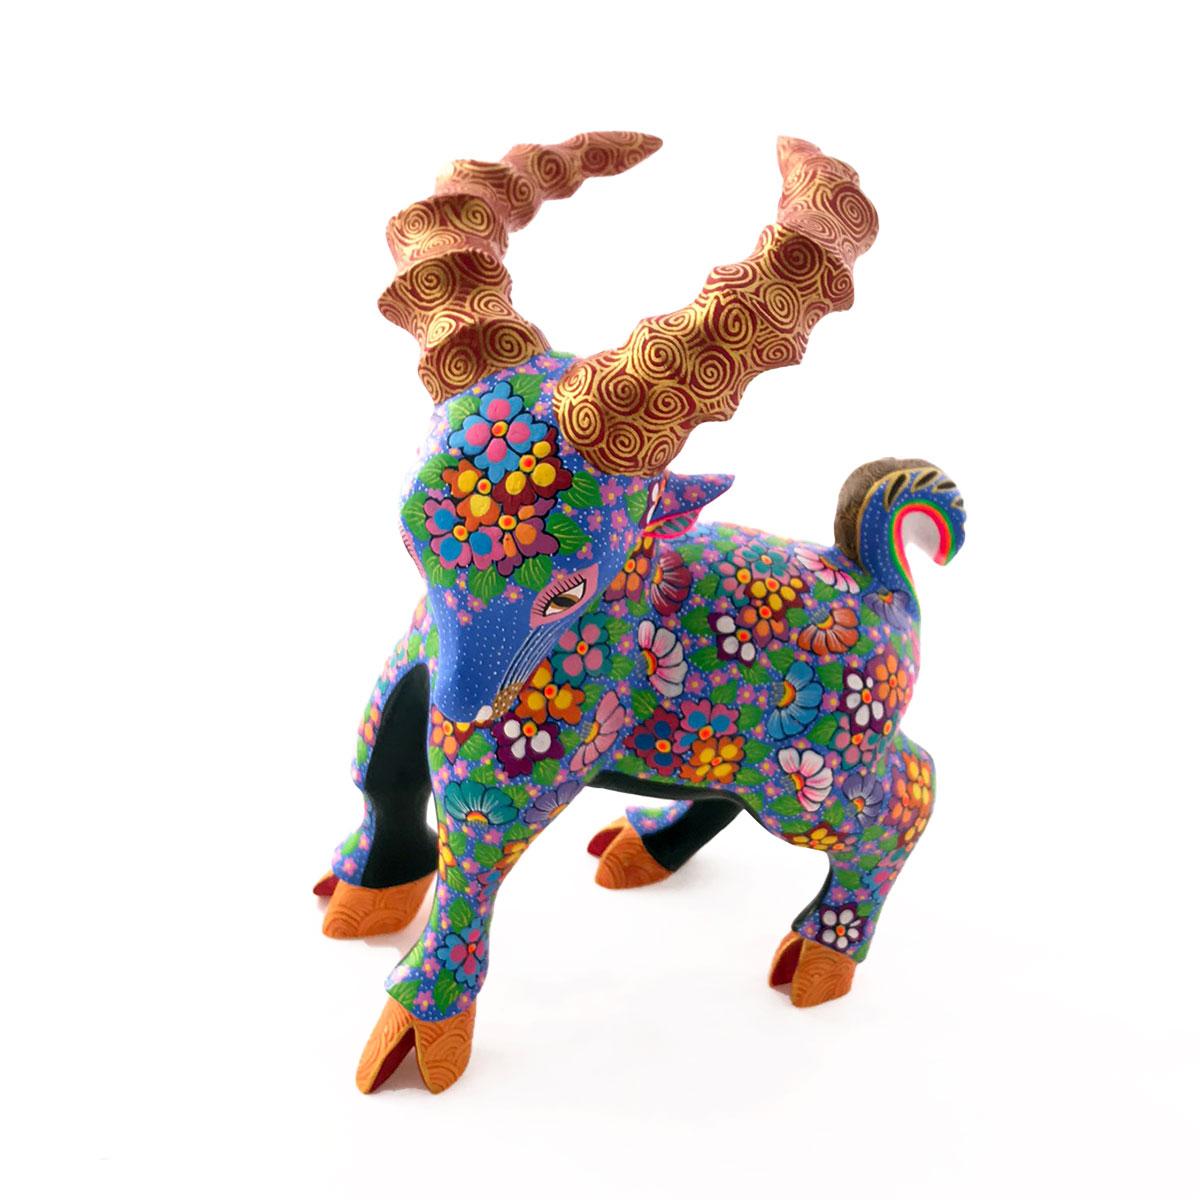 Maria Jimenez Maria Jimenez Ojeda: Floral Goat Goats